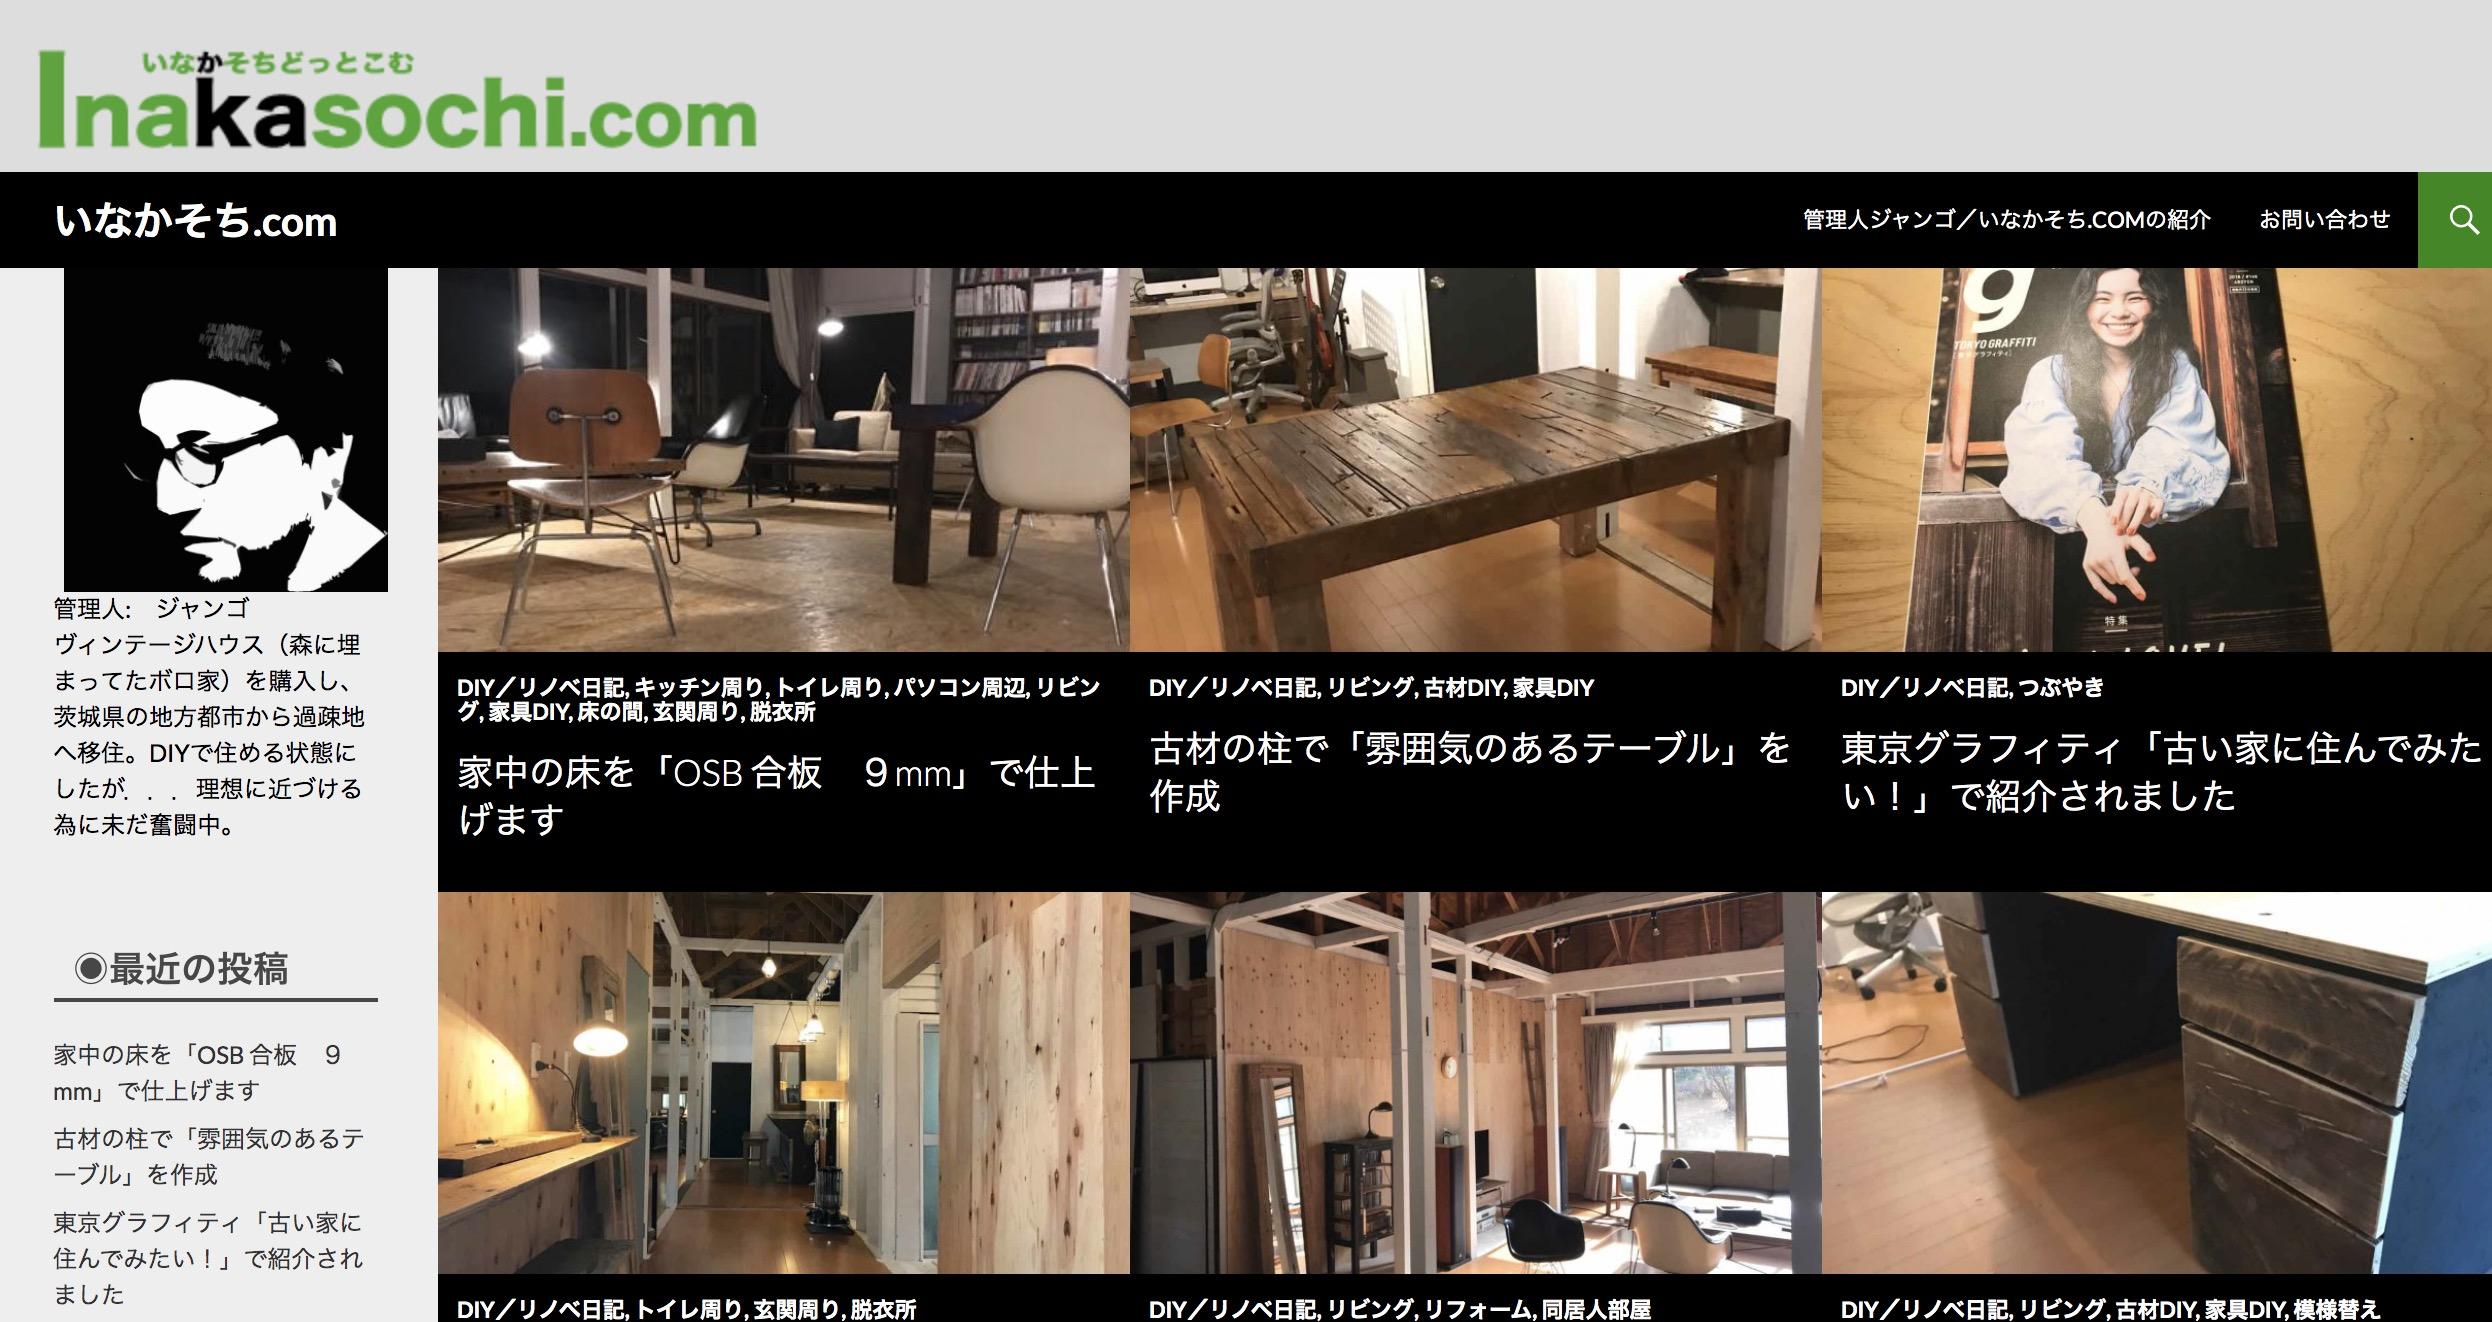 Inakasochi.com(いなかそちどっとこむ)